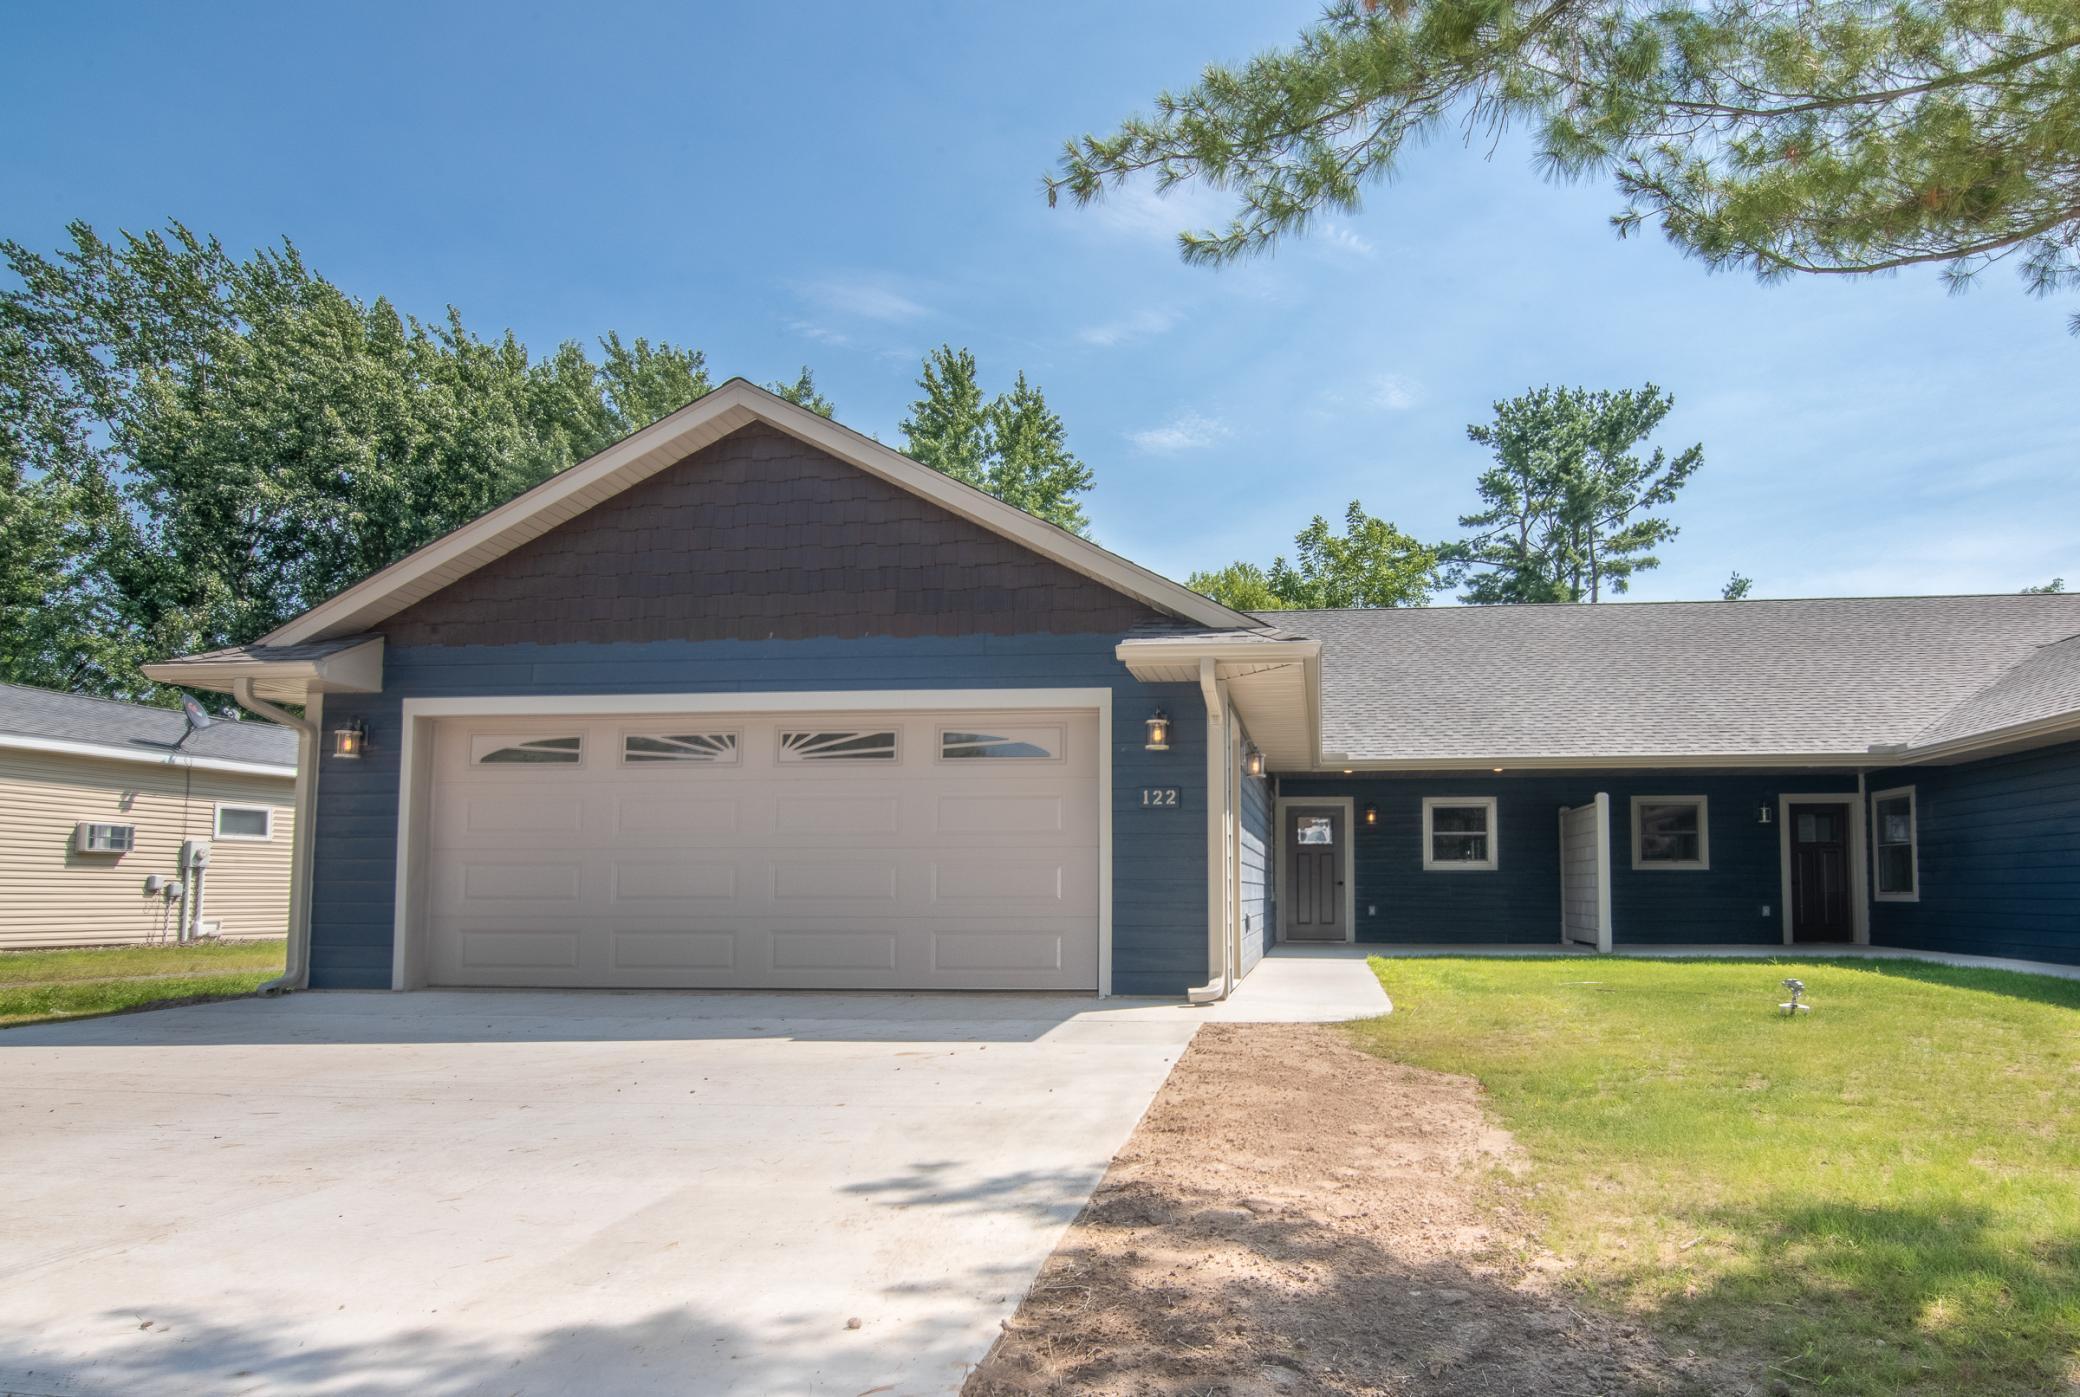 120 Pine Street N Property Photo - Turtle Lake Twp, WI real estate listing